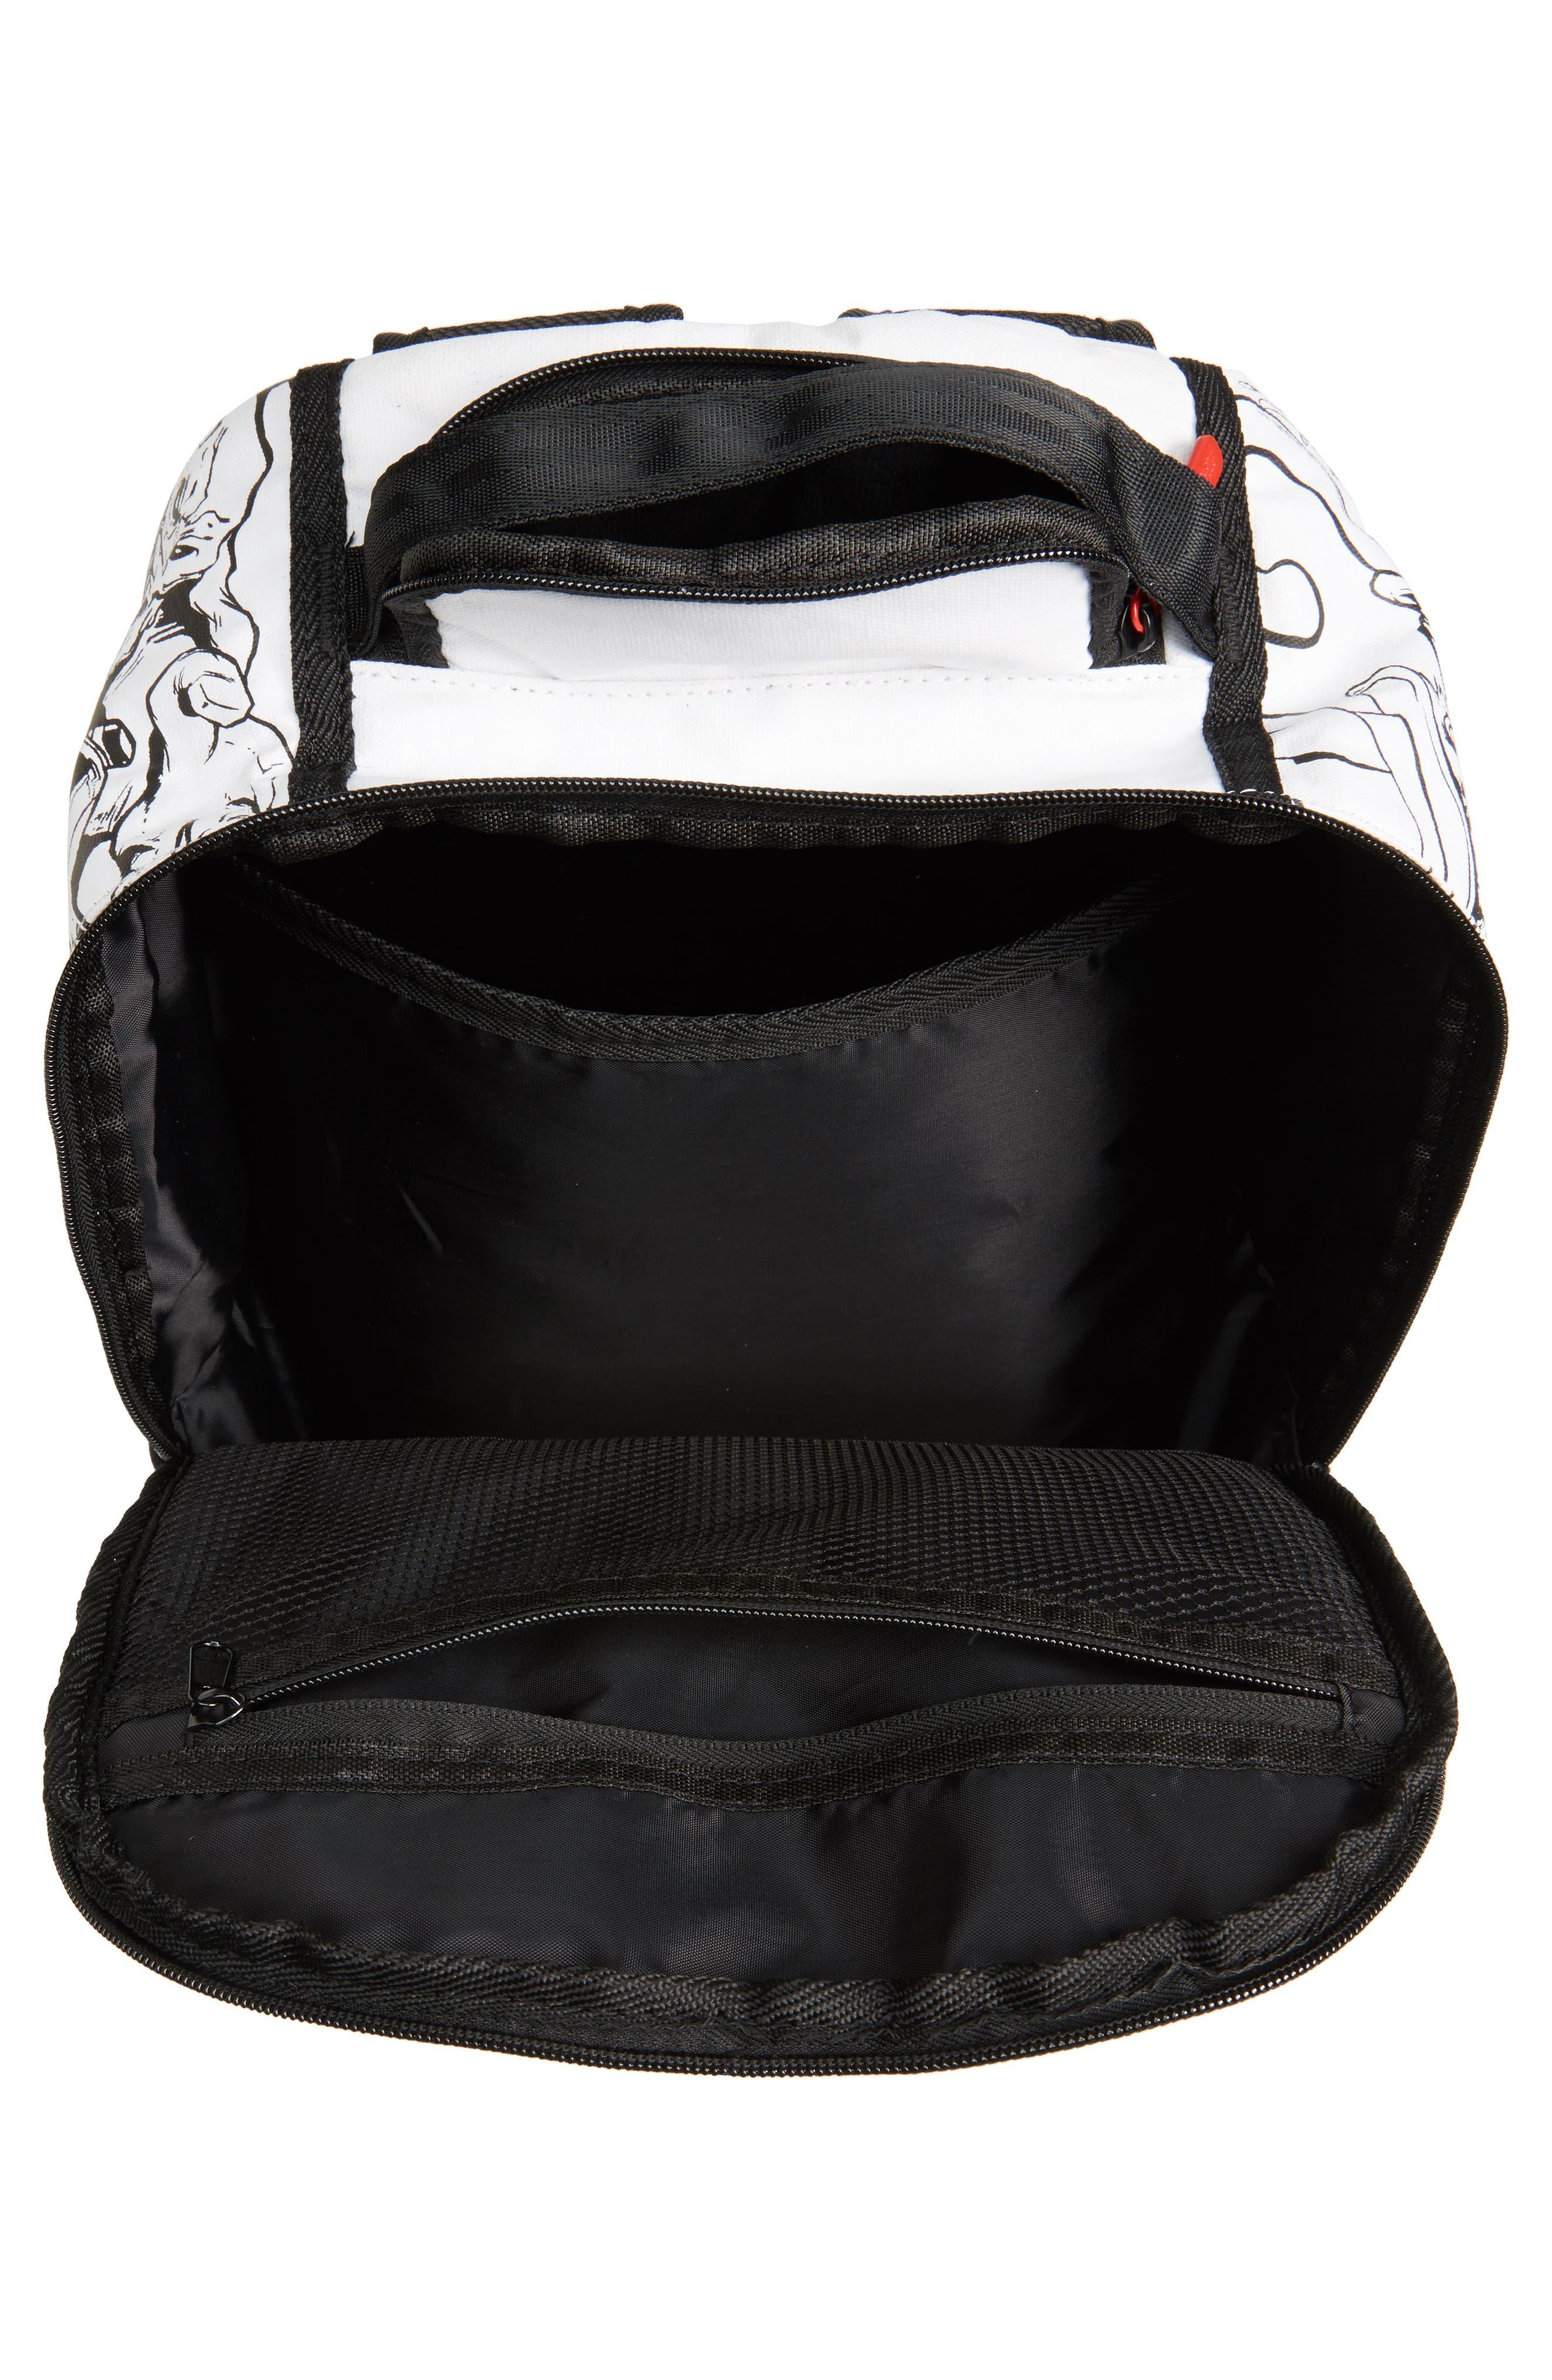 Batman DIY Villains Backpack,                             Alternate thumbnail 4, color,                             Black/ White